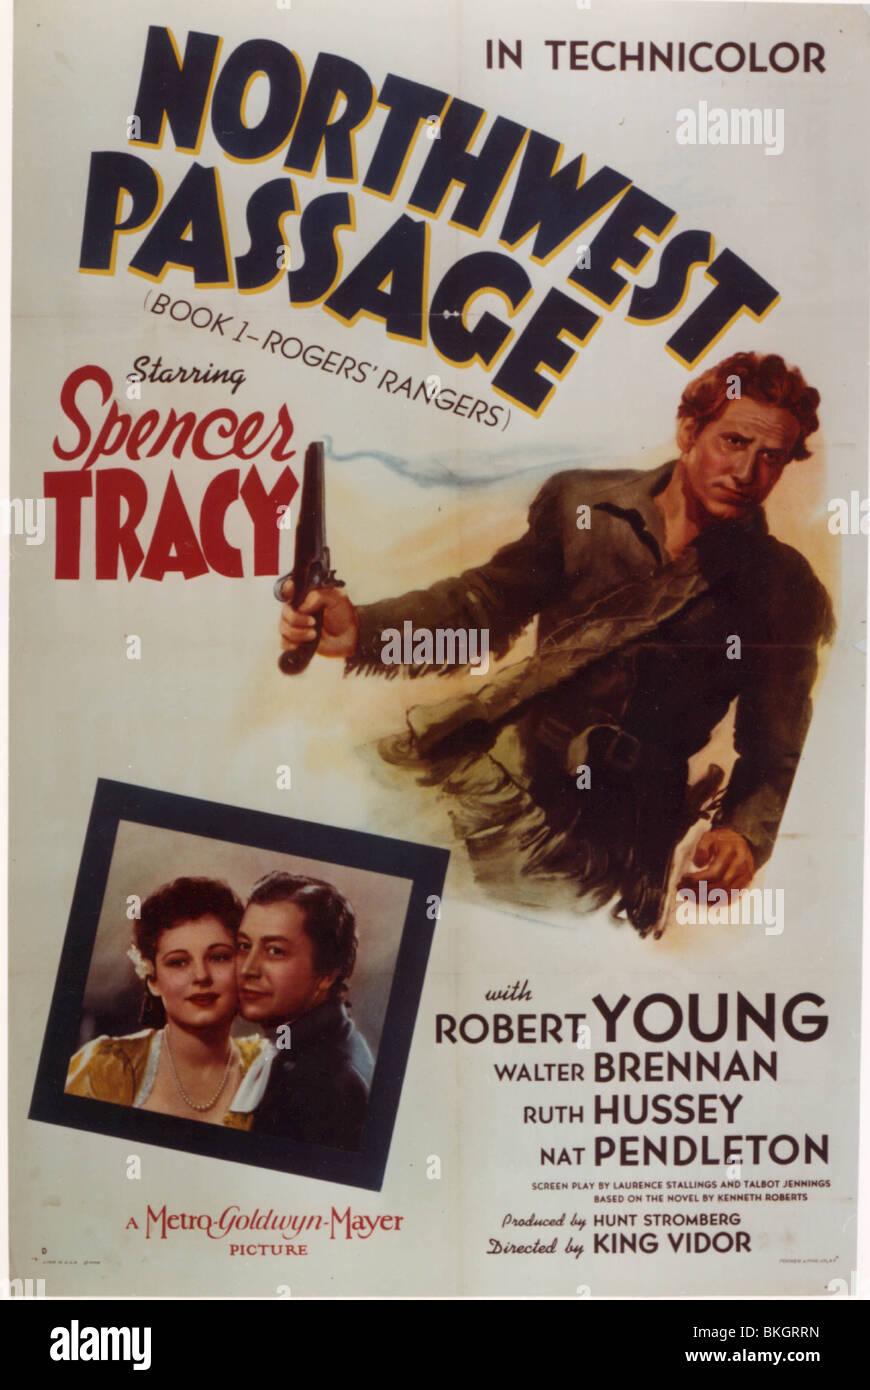 NORTHWEST PASSAGE -1940 POSTER - Stock Image